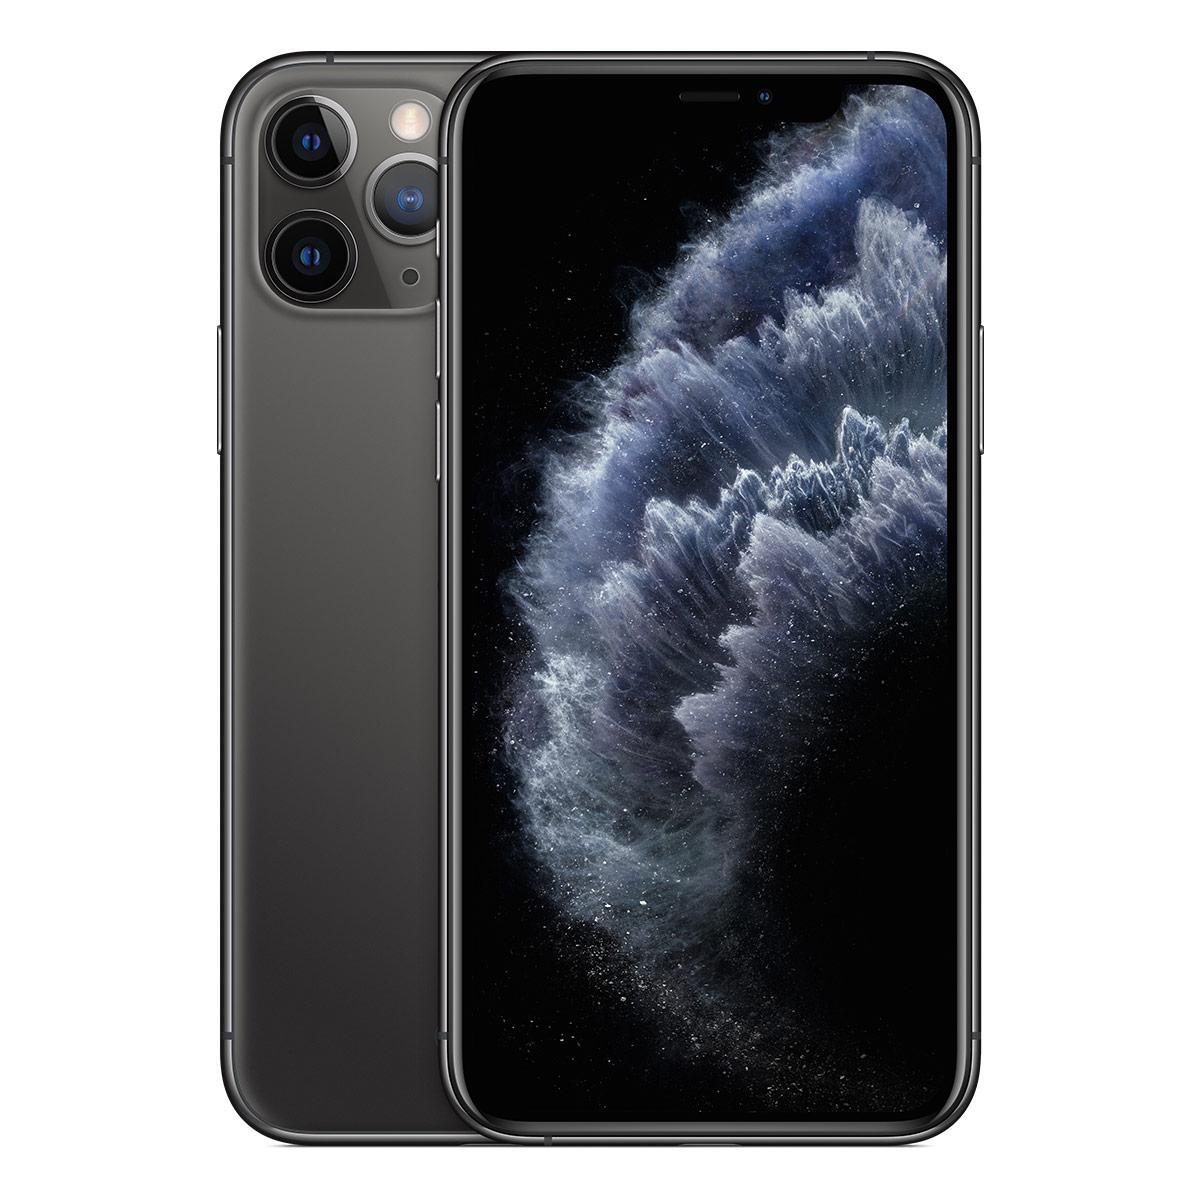 Apple iPhone 11 Pro 64GB Space Grey - Unlocked